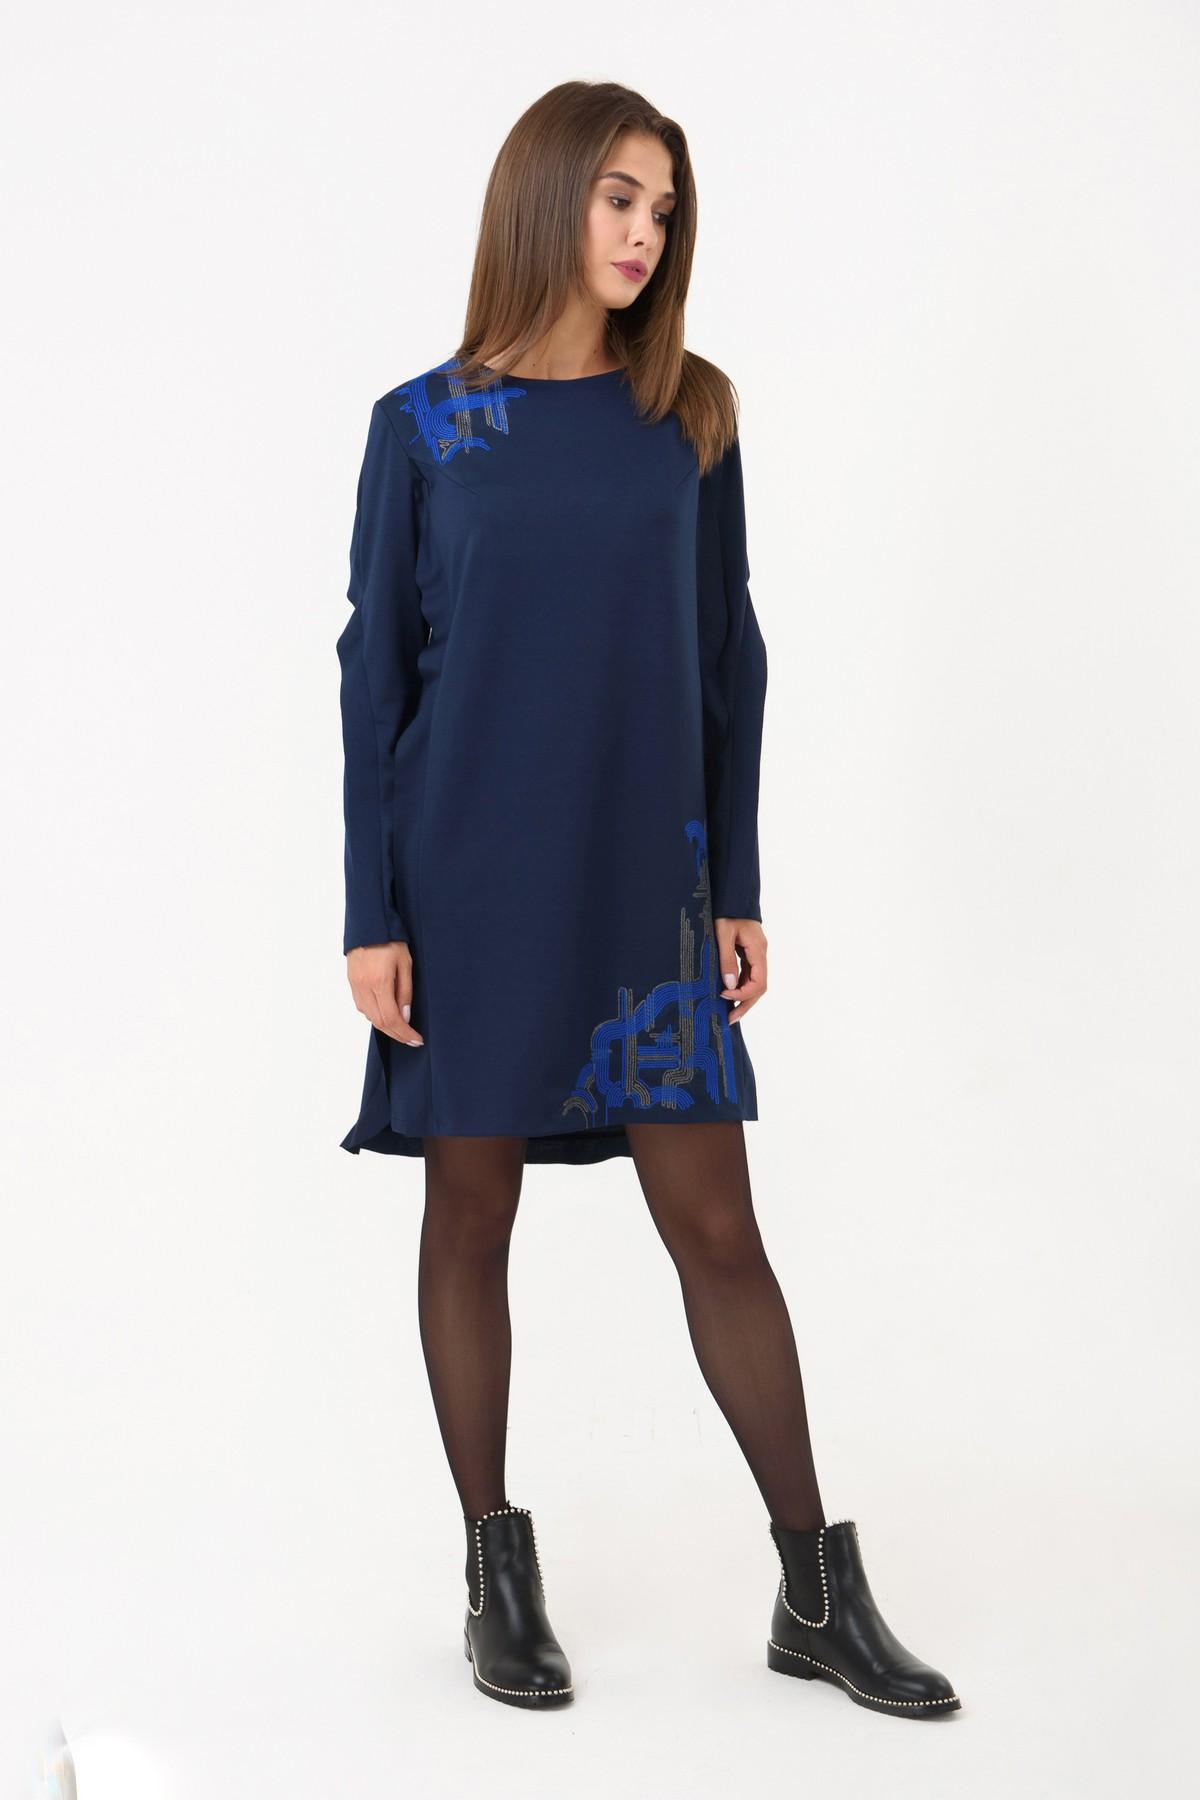 e048d313176f Осеннее платье прямого силуэта RM1243-18DD, синий, нажмите для увеличения